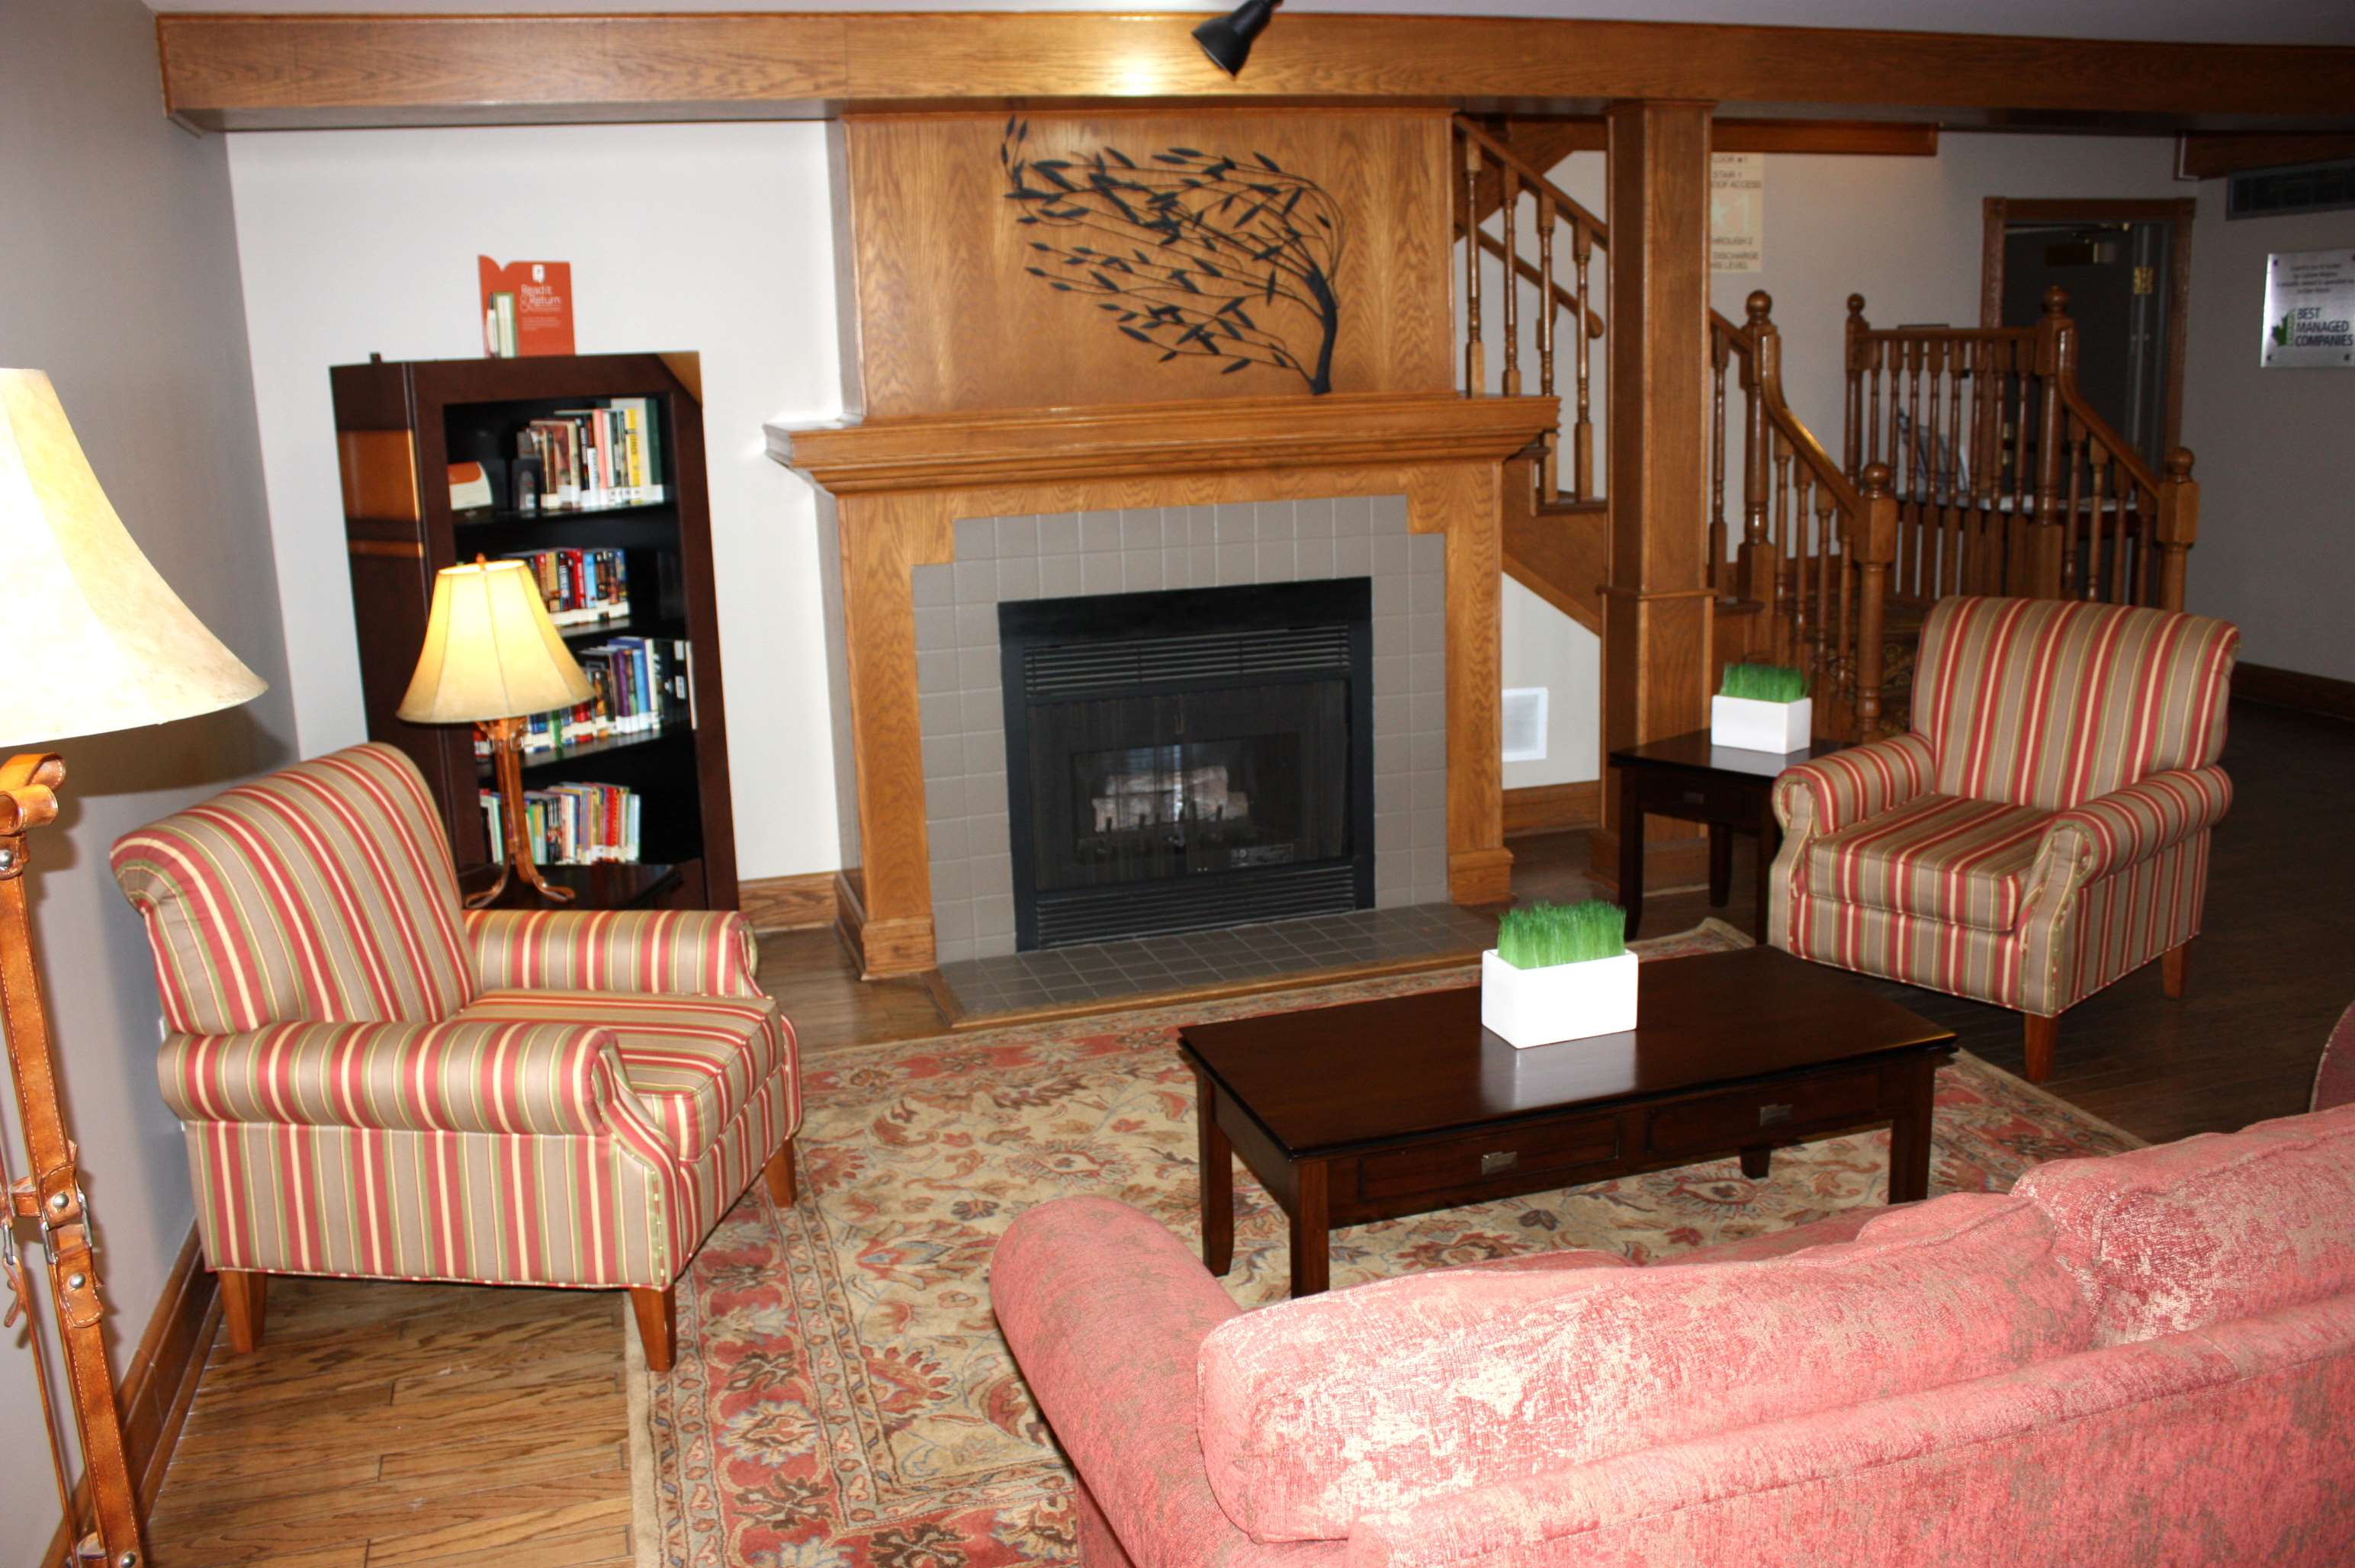 Country Inn & Suites by Radisson, Regina, SK in Regina: Lobby